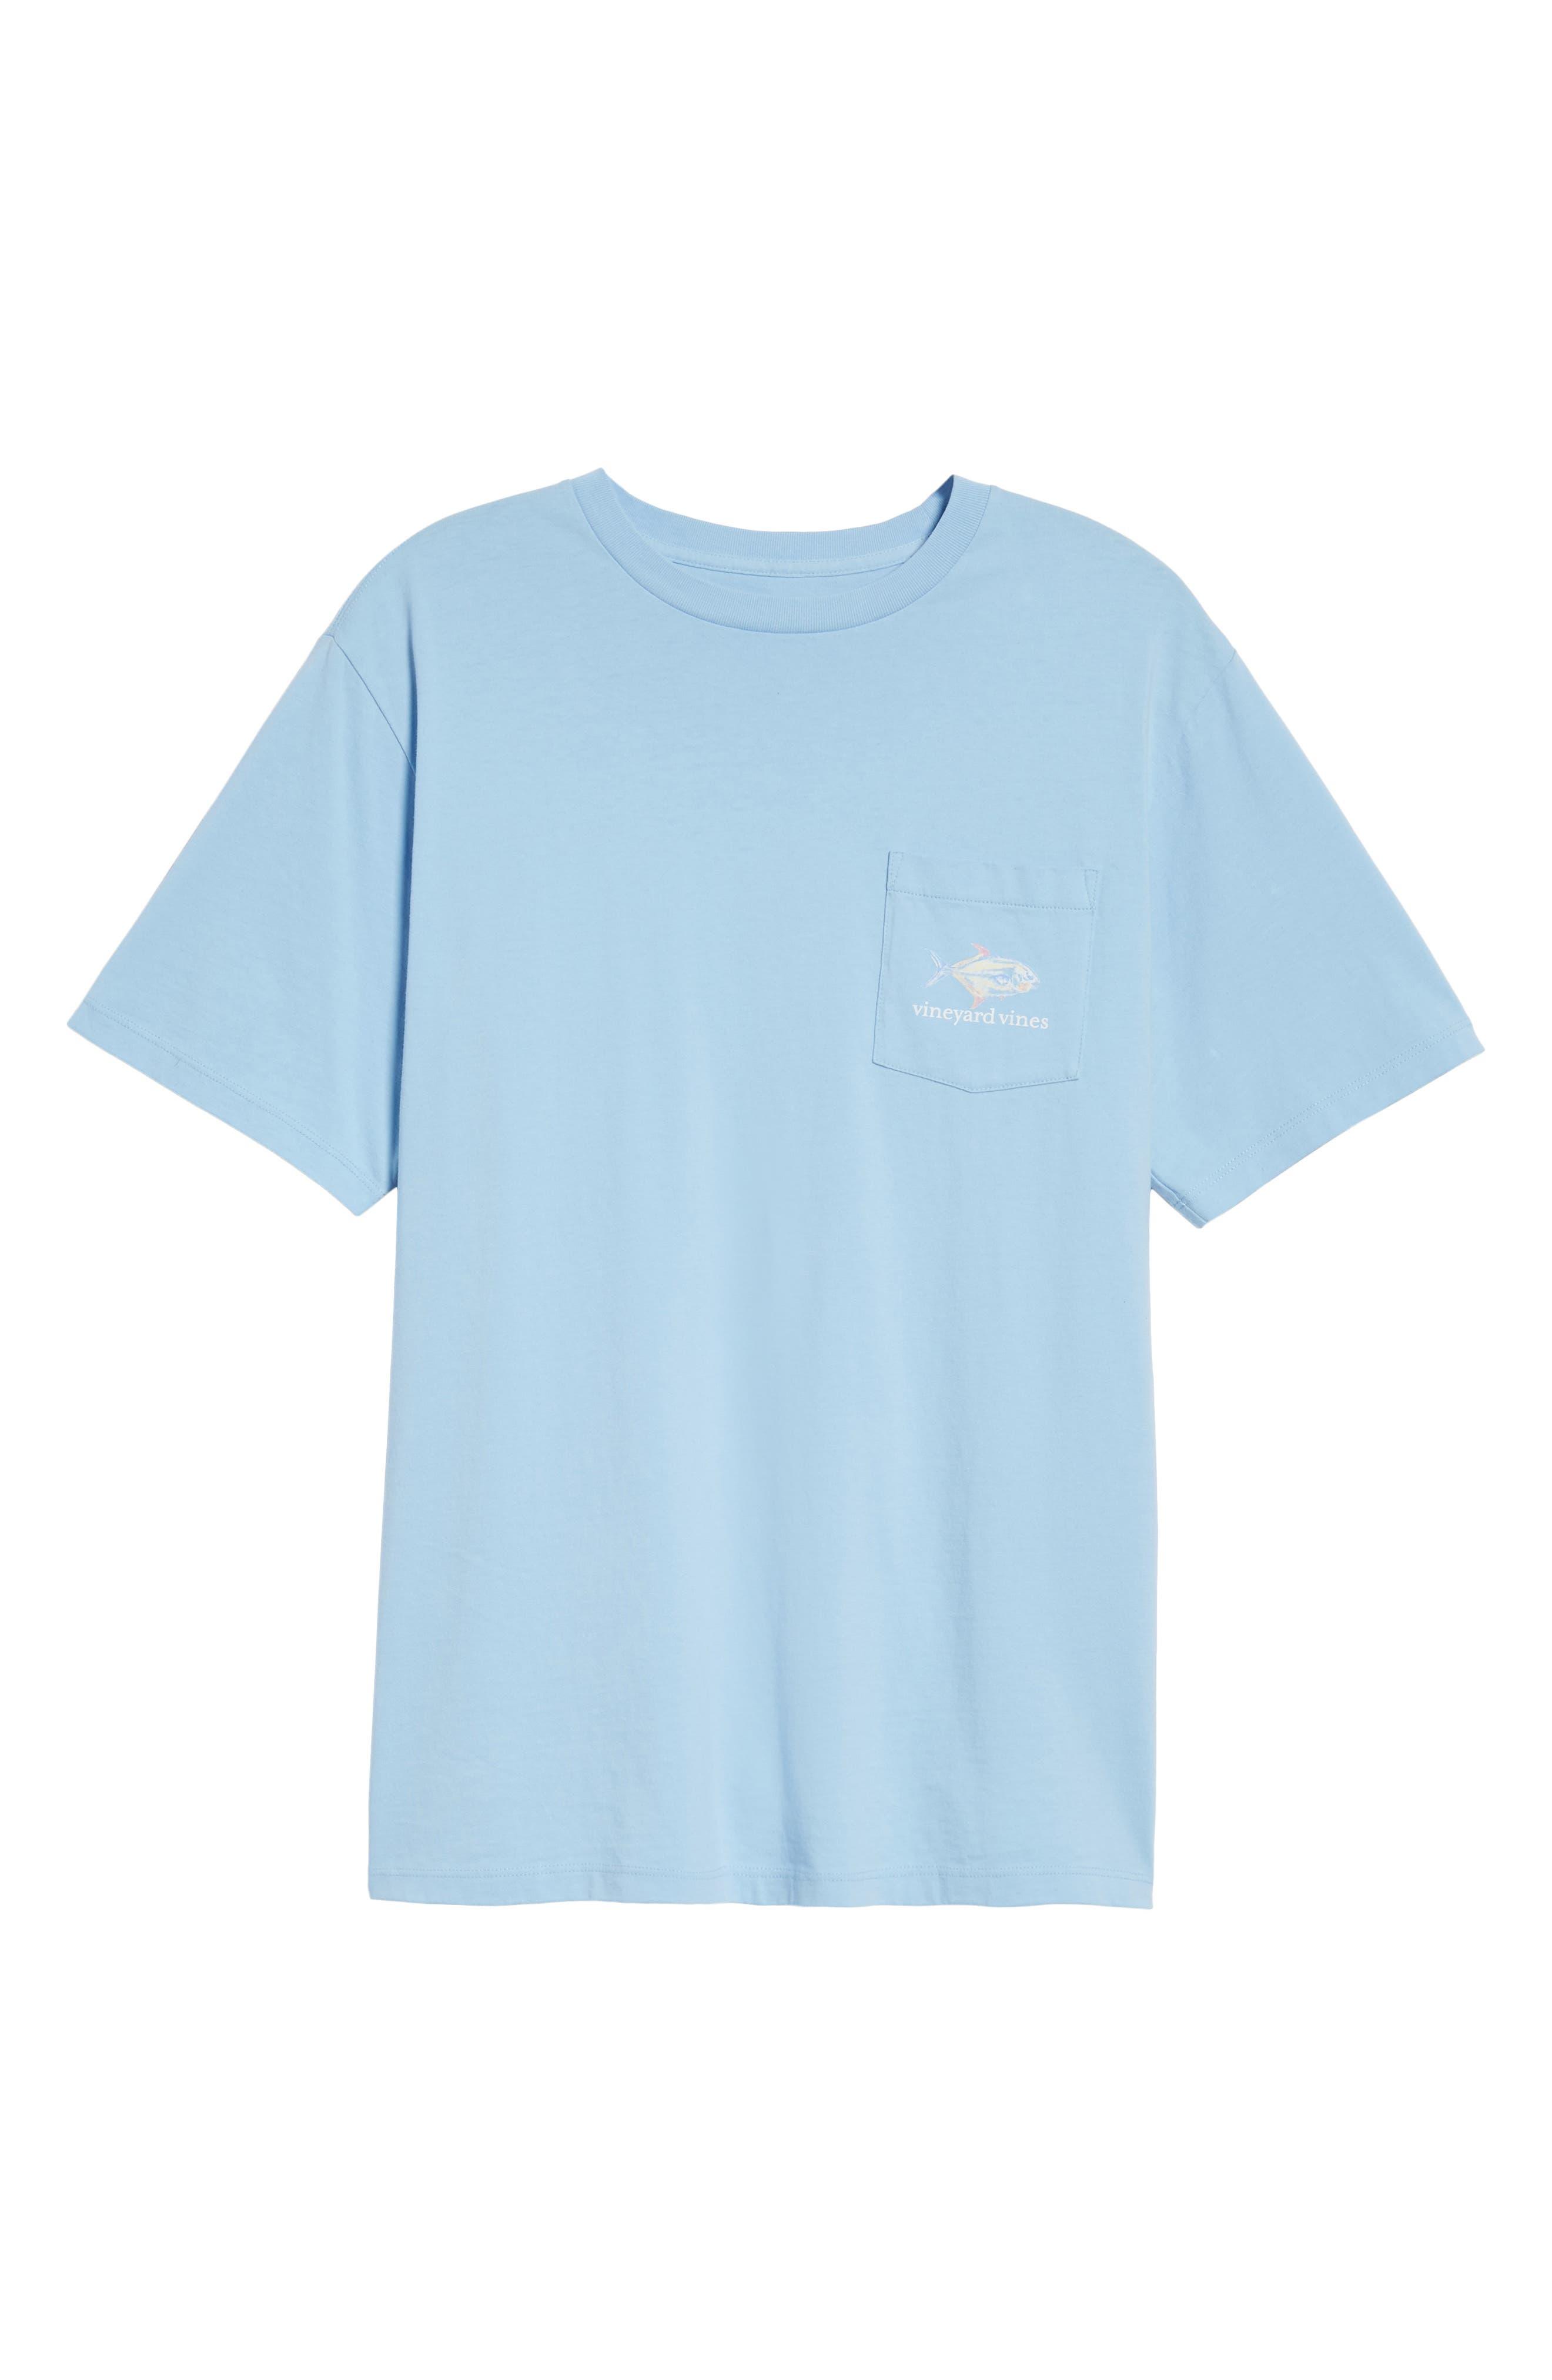 Painted Permit Graphic Pocket T-Shirt,                             Alternate thumbnail 6, color,                             Jake Blue